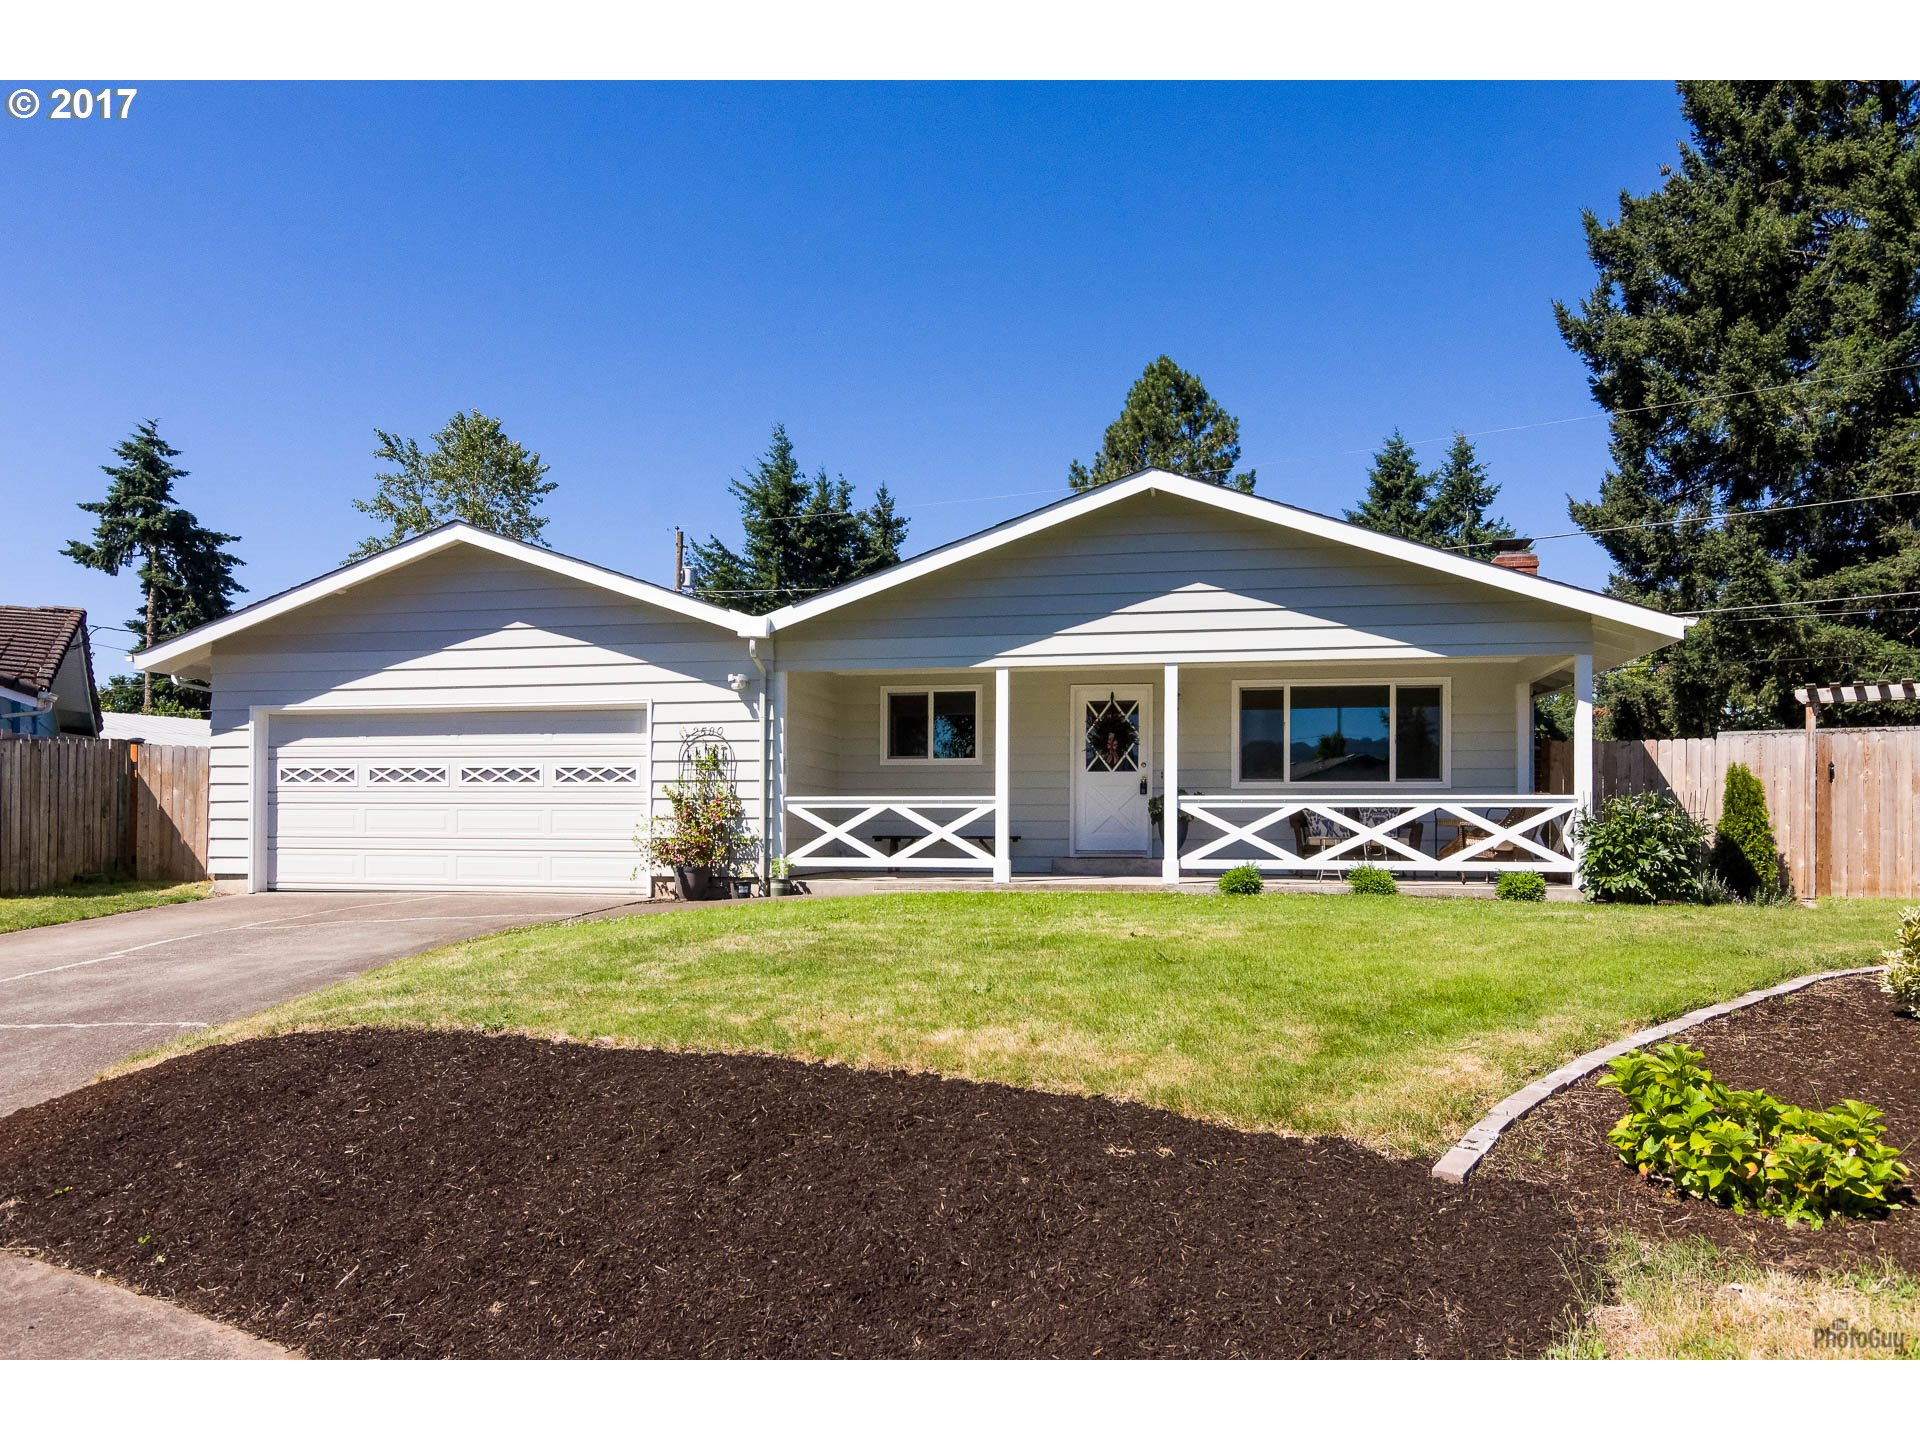 2580 GAY ST, Eugene OR 97408